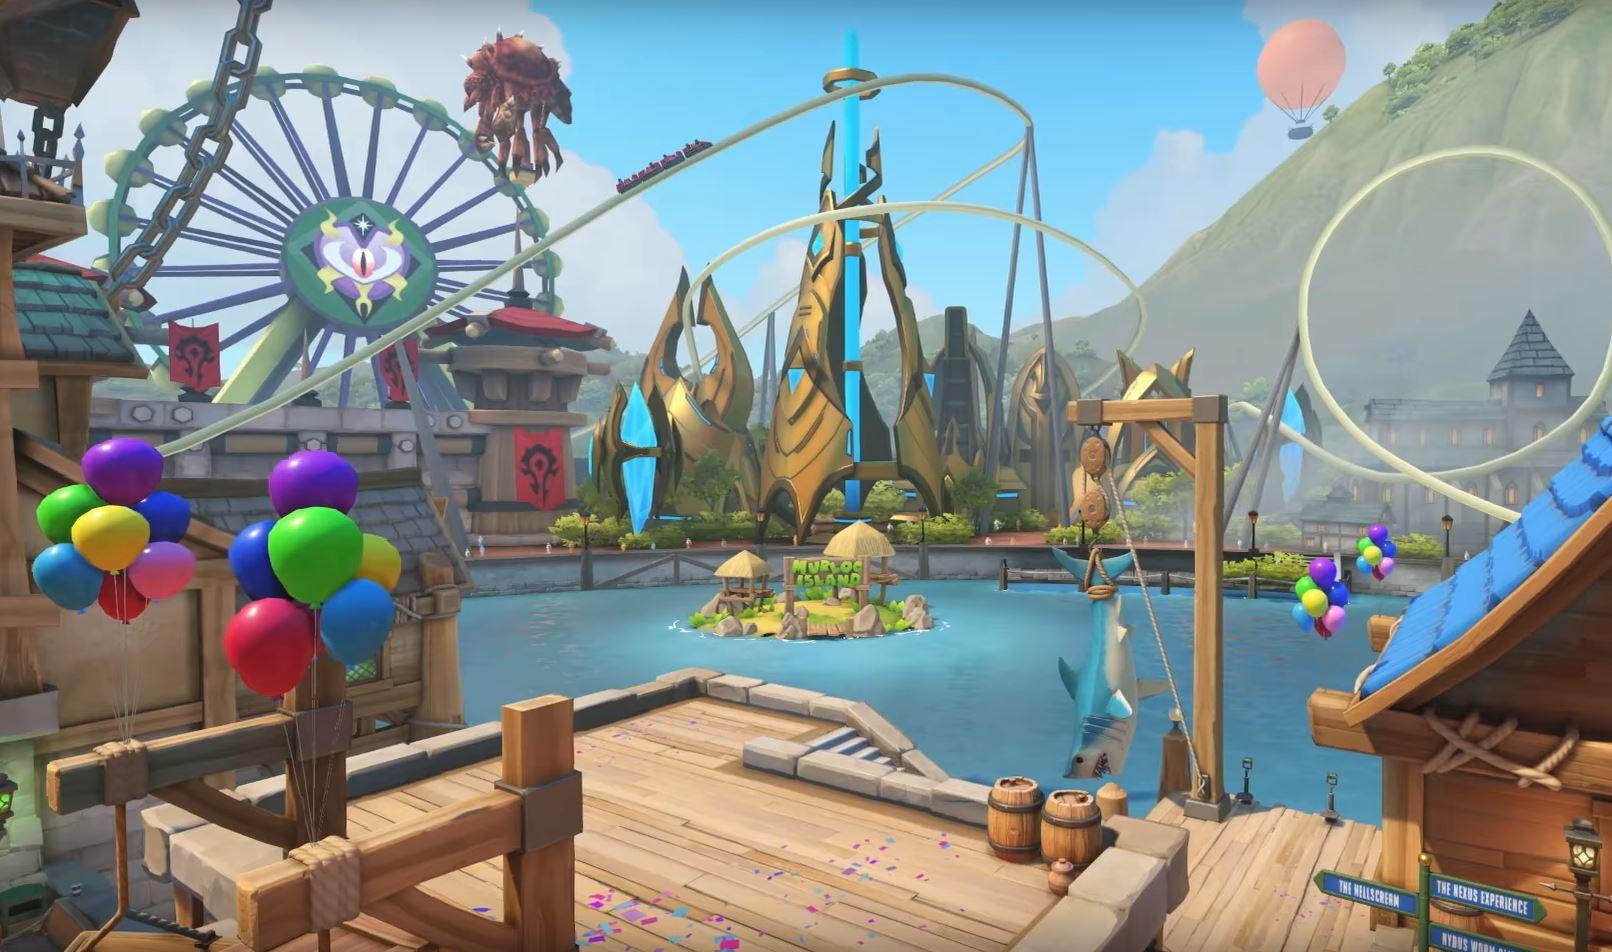 BlizzCon 2017: Overwatch Gets New Map, Blizzard World